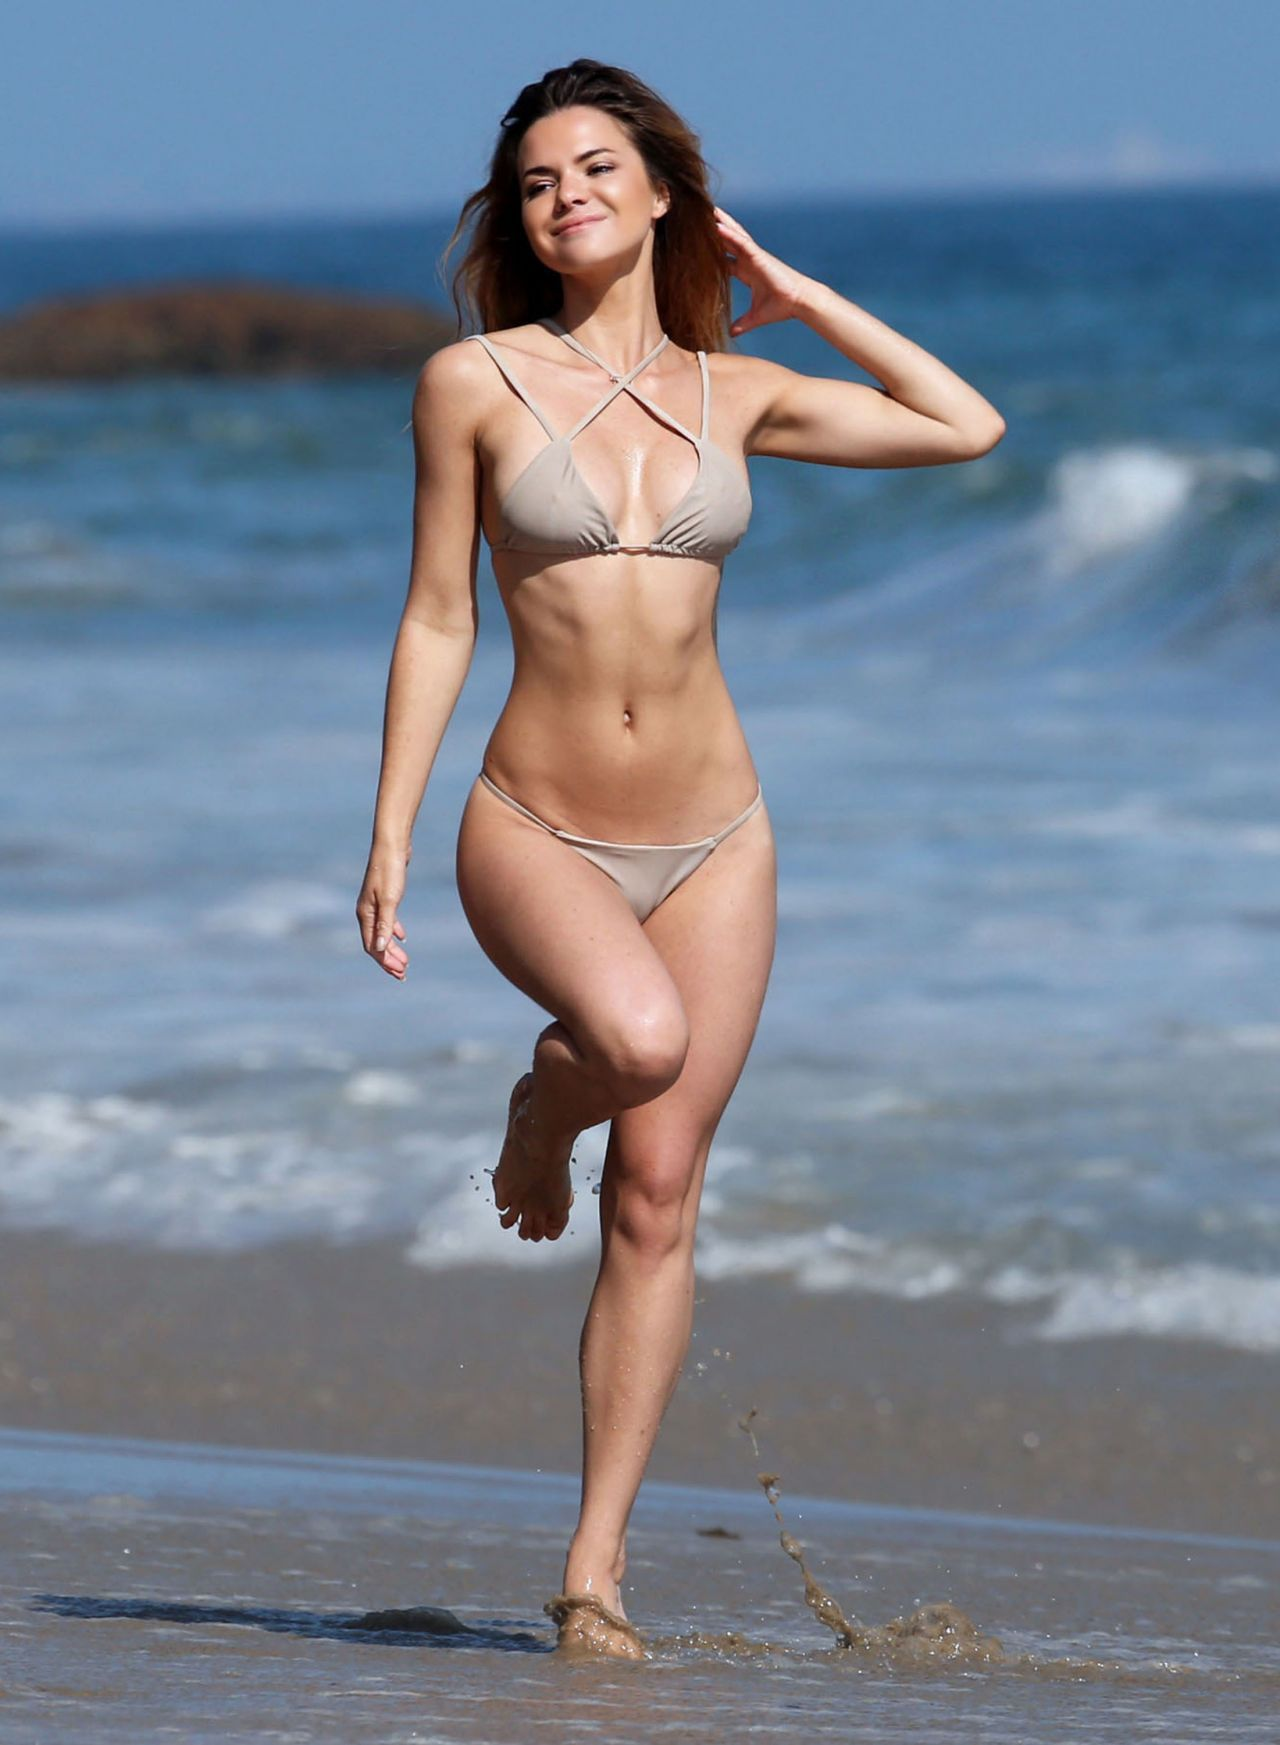 Bikini Kaili Thorne nude (66 photos), Pussy, Fappening, Feet, butt 2020